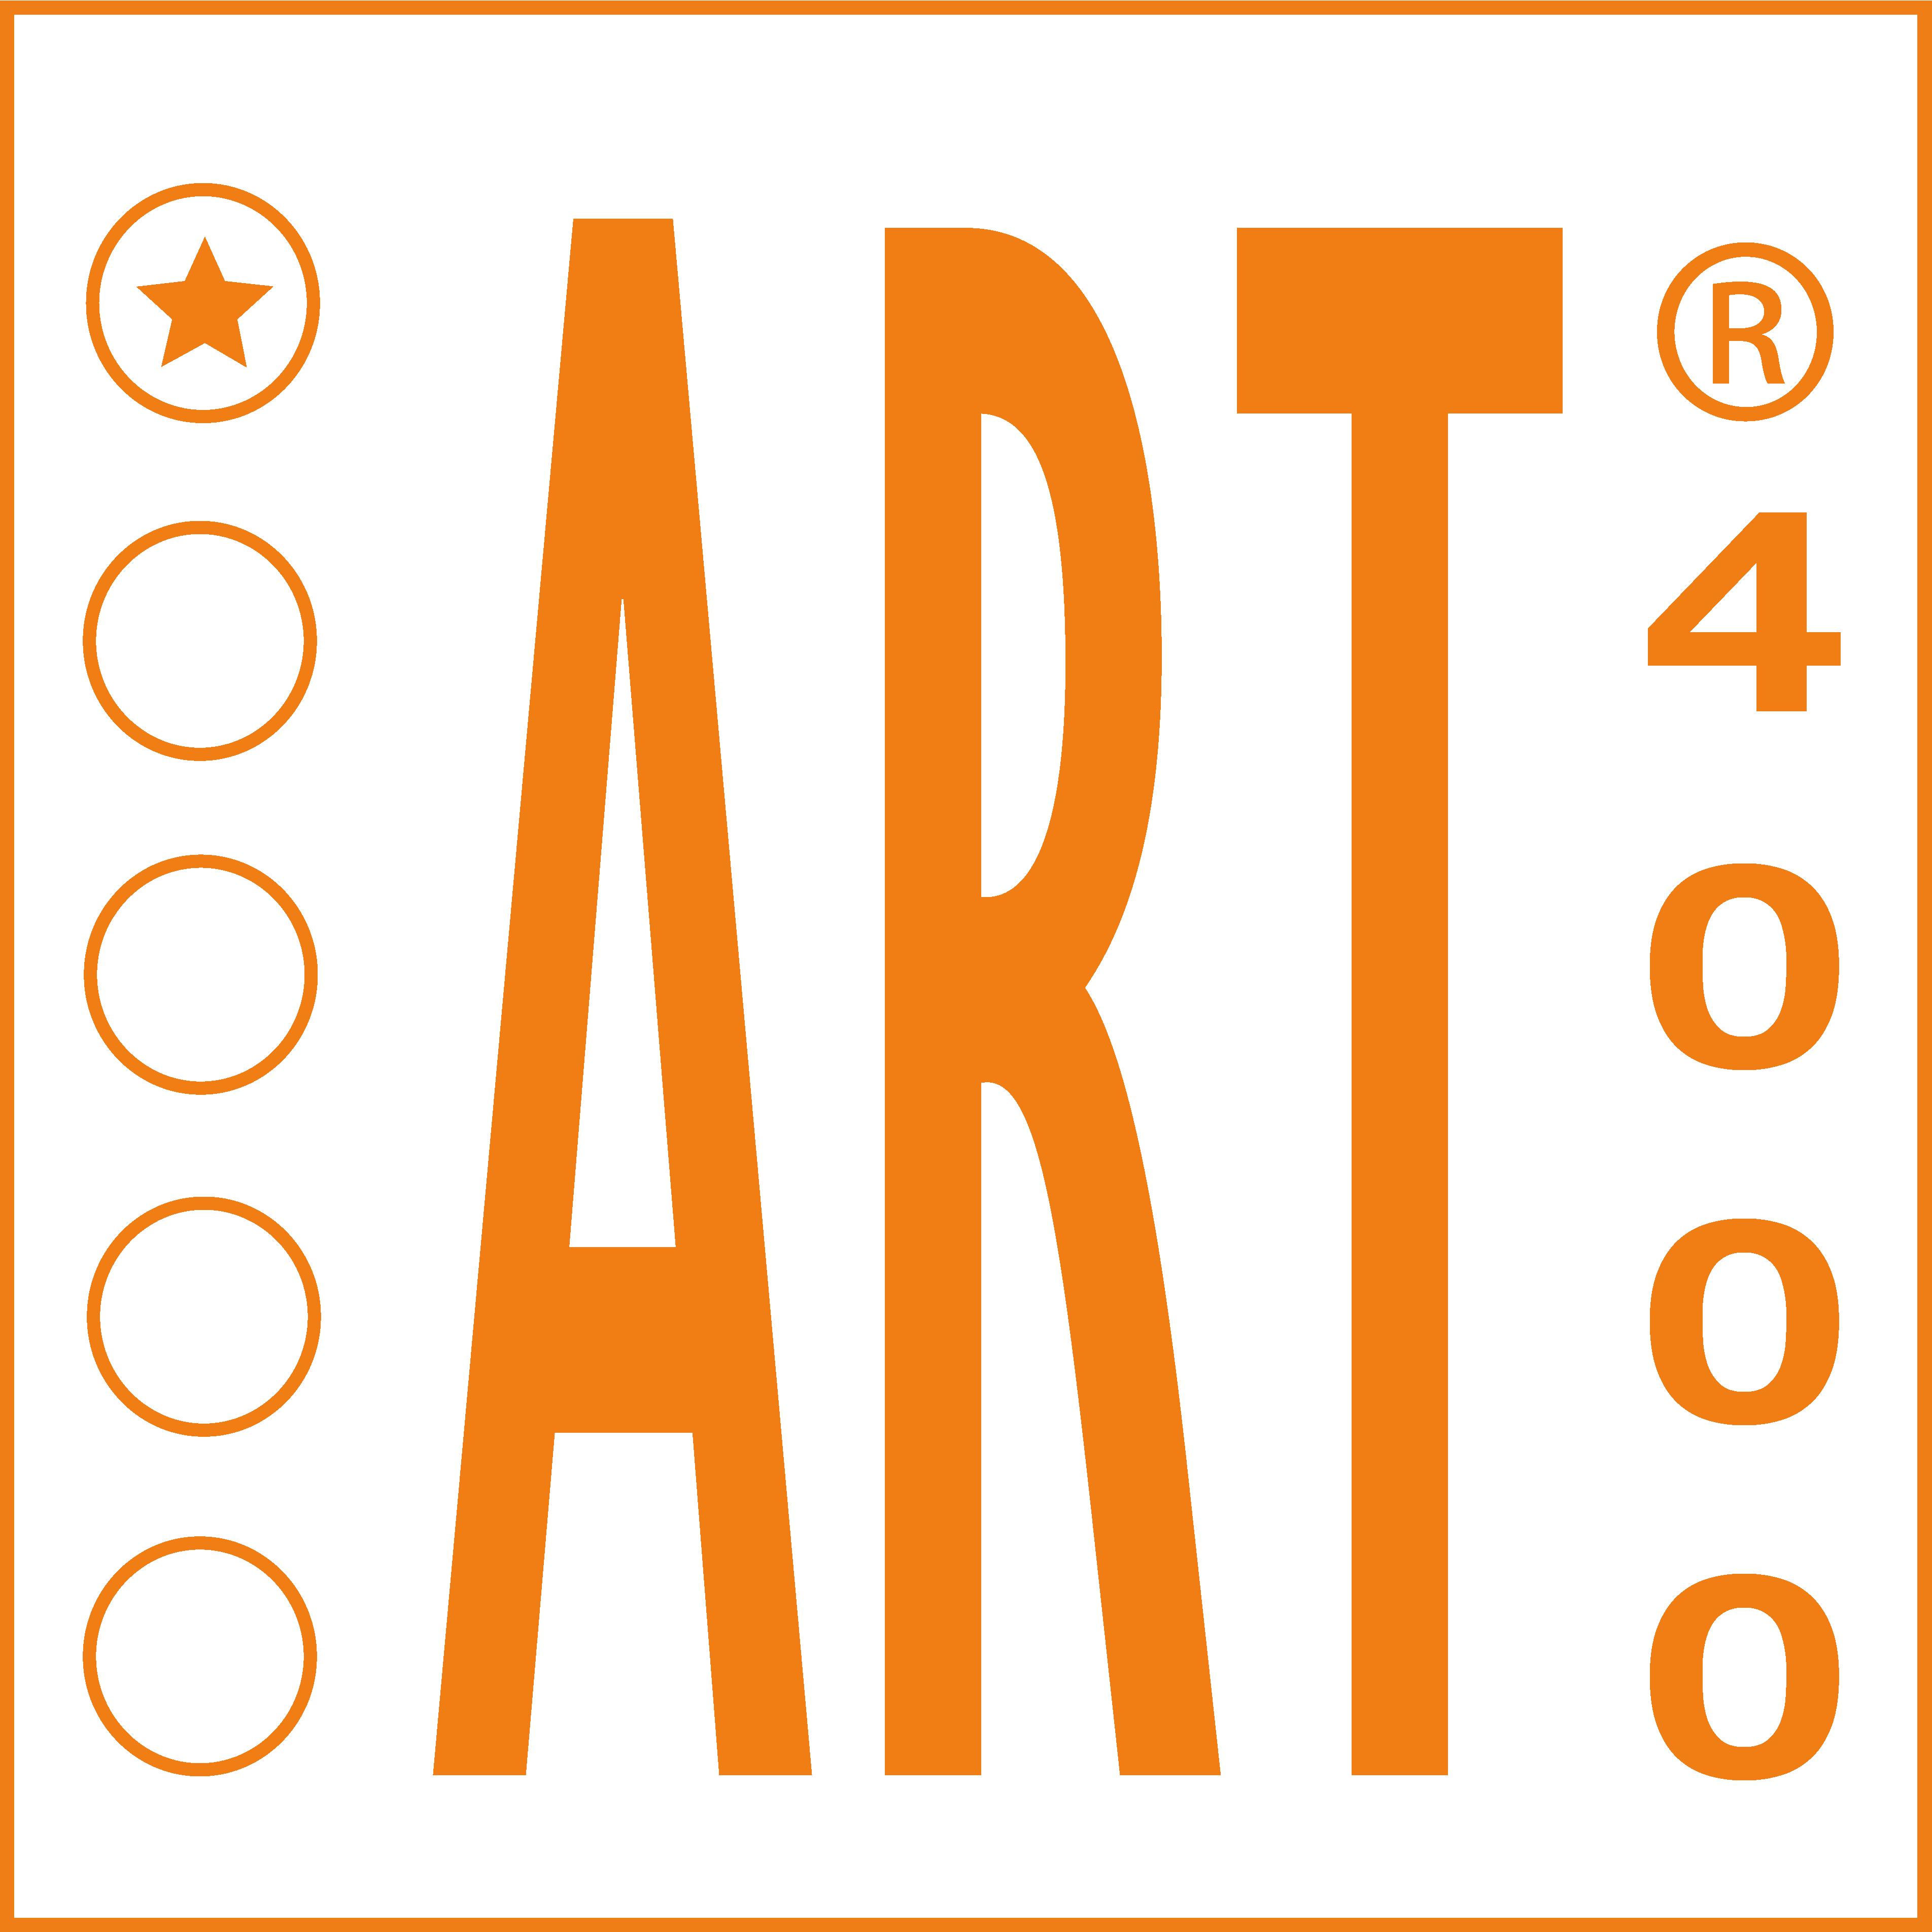 Vinz Kibo Kabelslot ART & VBV - 10 Meter